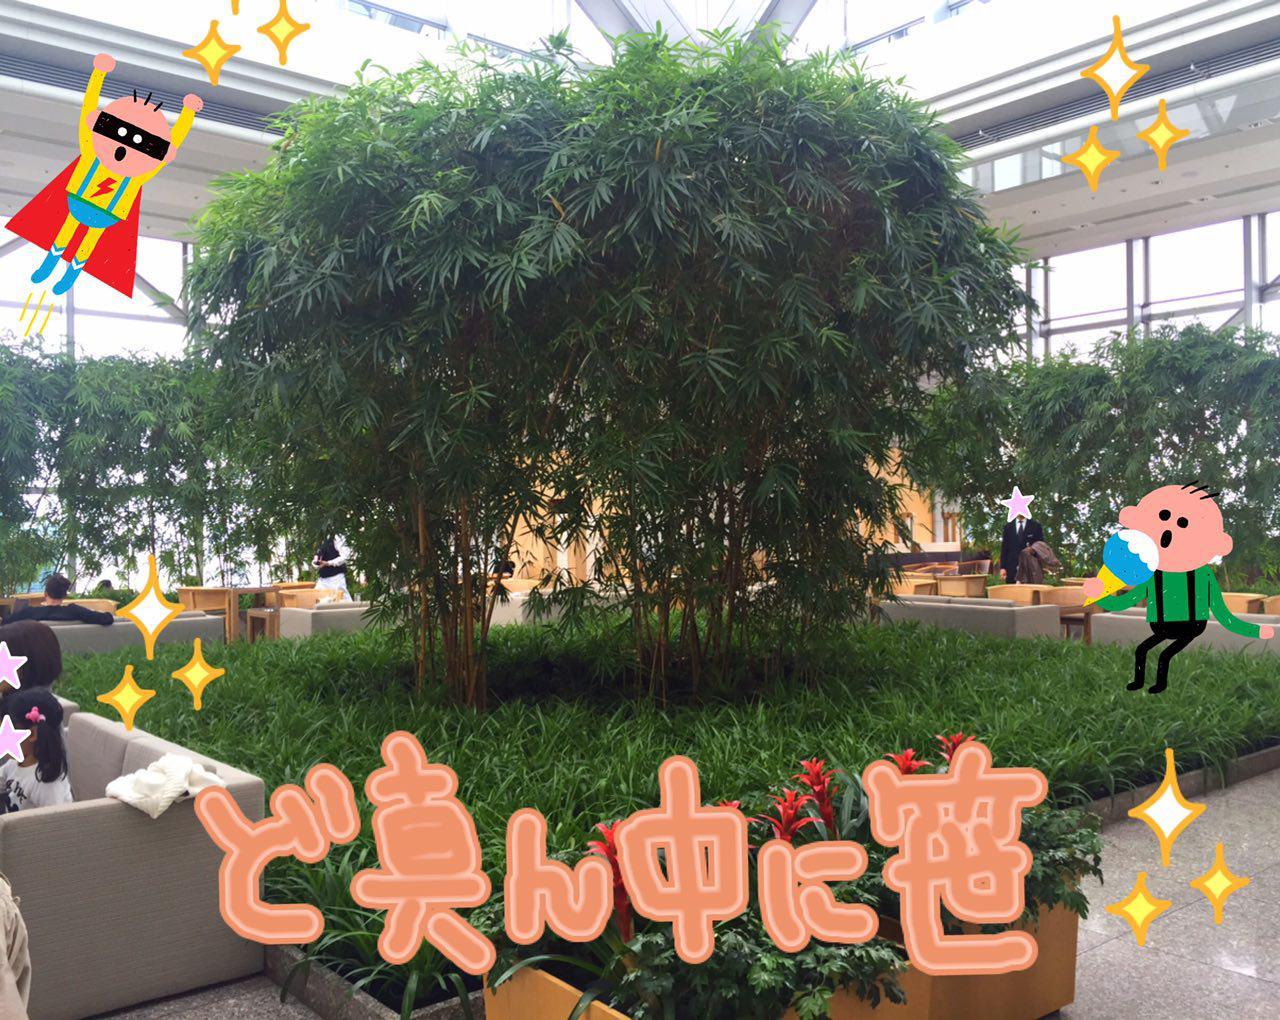 photo_2017-04-01_00-14-33.jpg